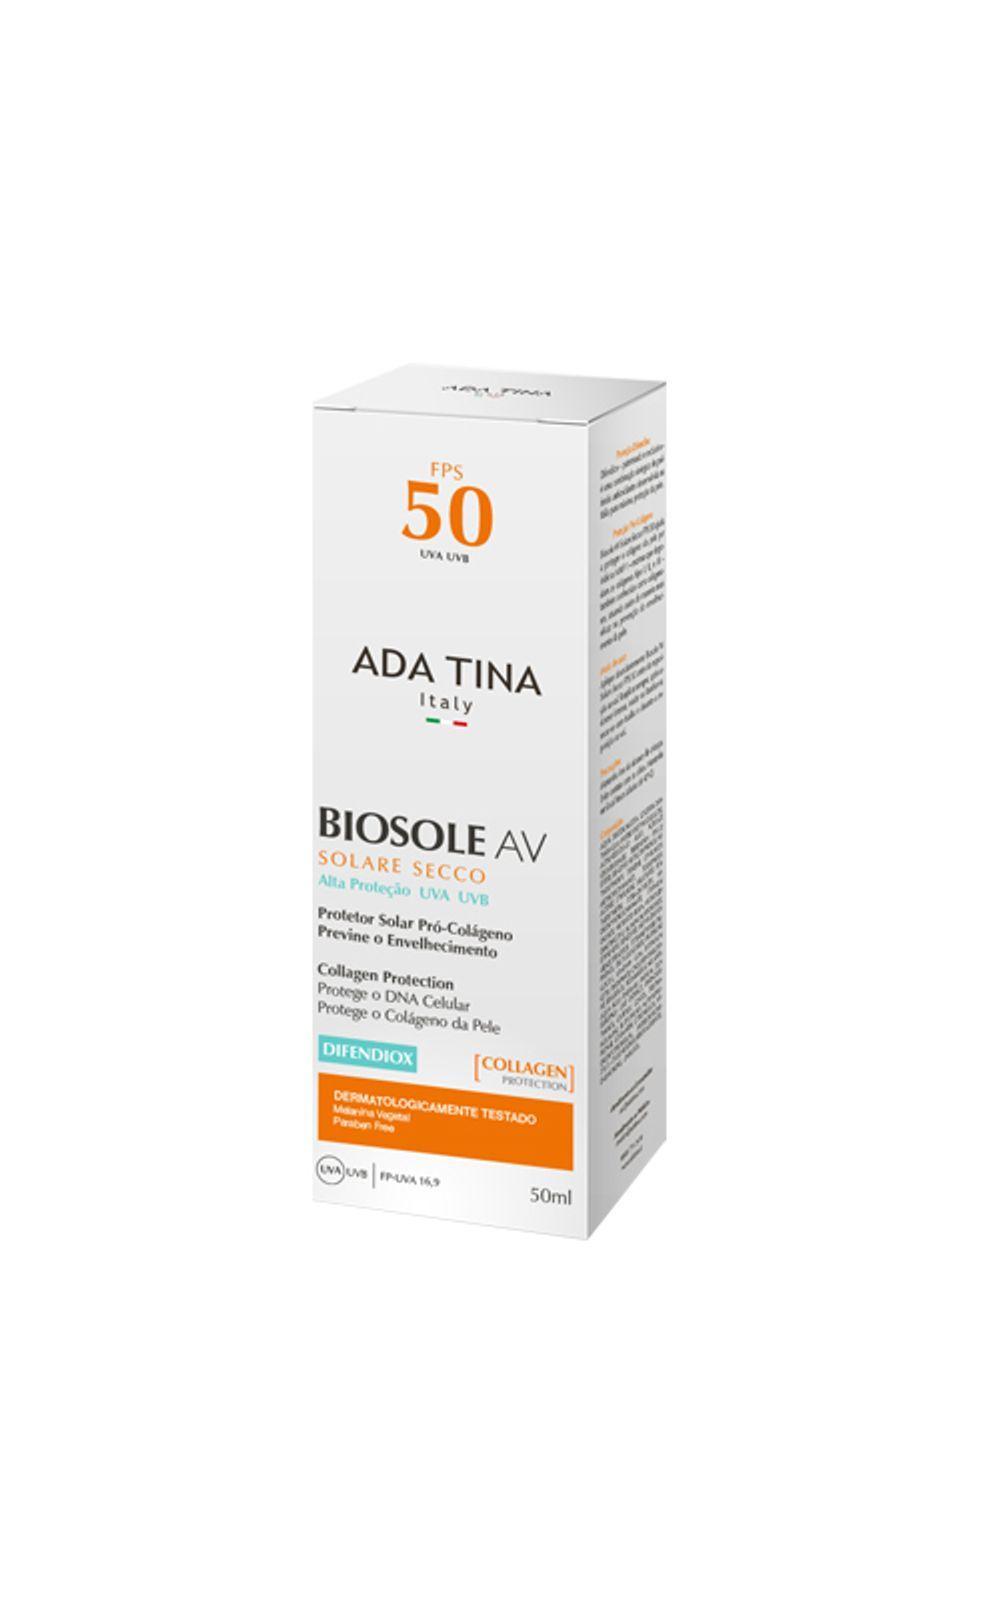 Foto 1 - Biosole AV Ada Tina - Protetor Solar - 50ml